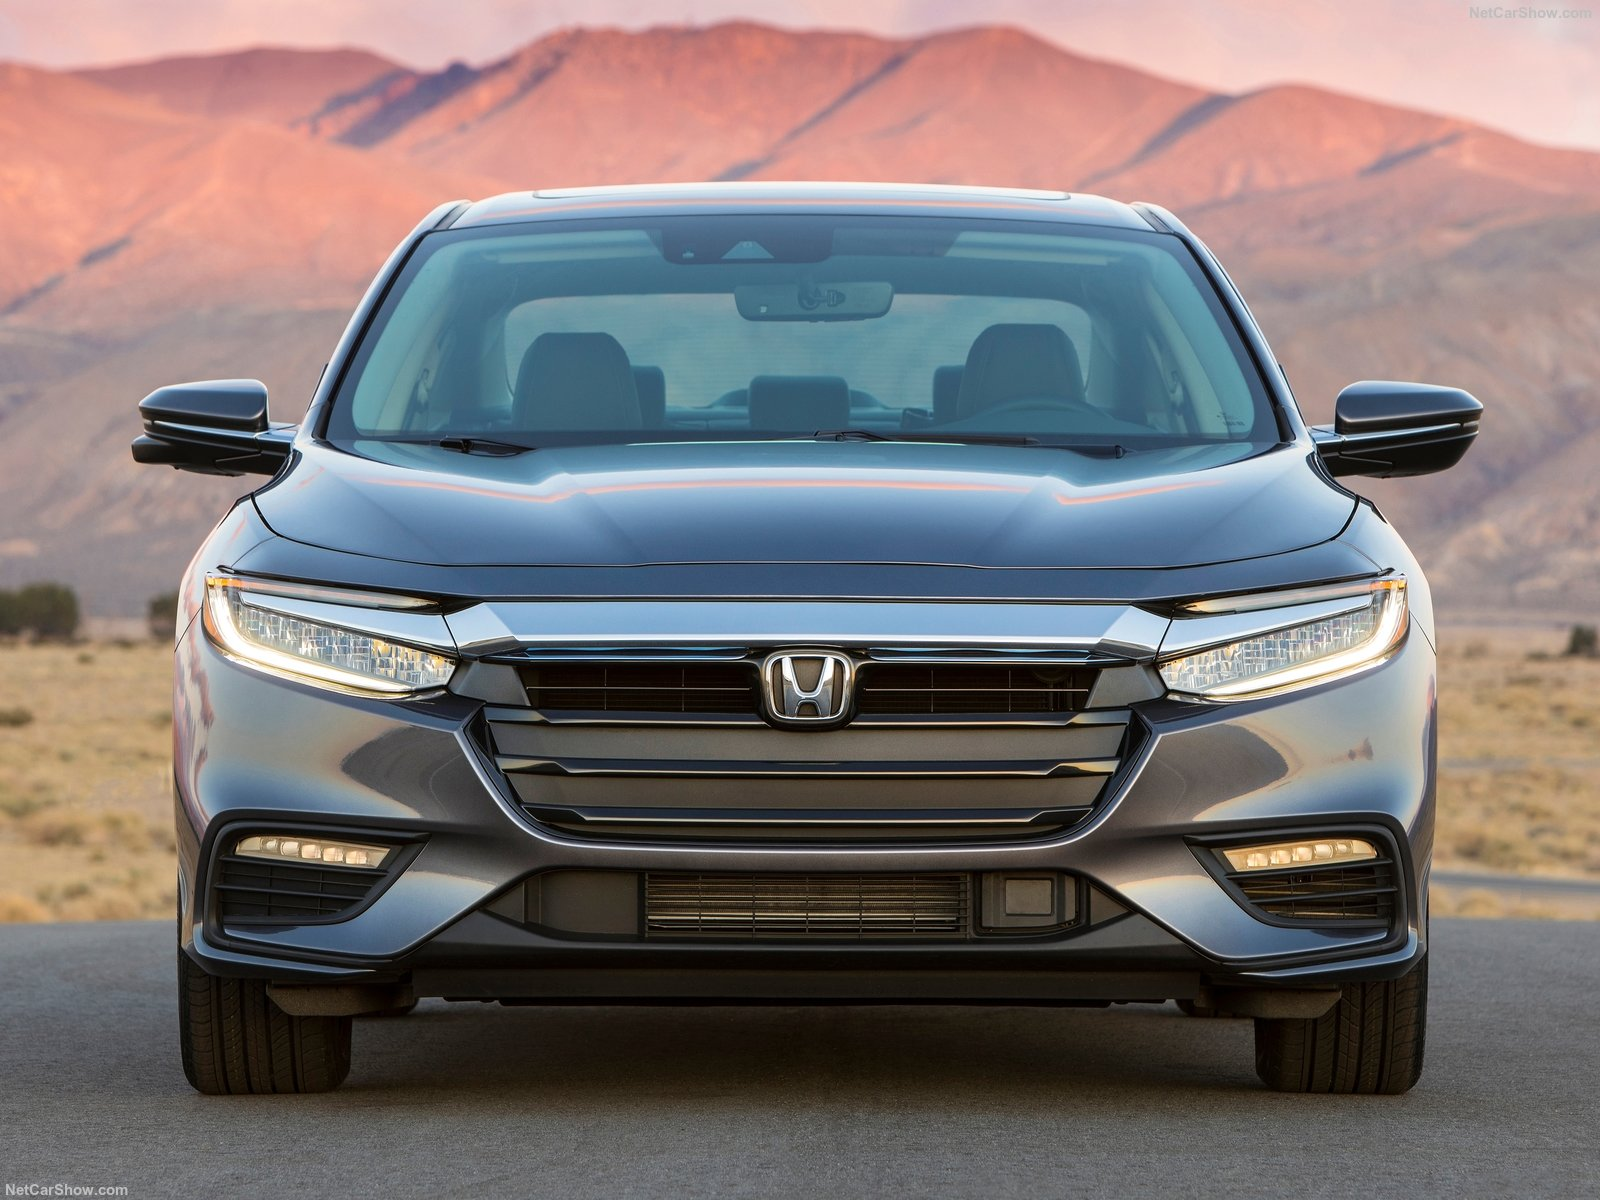 Honda-Insight-2019-1600-3a